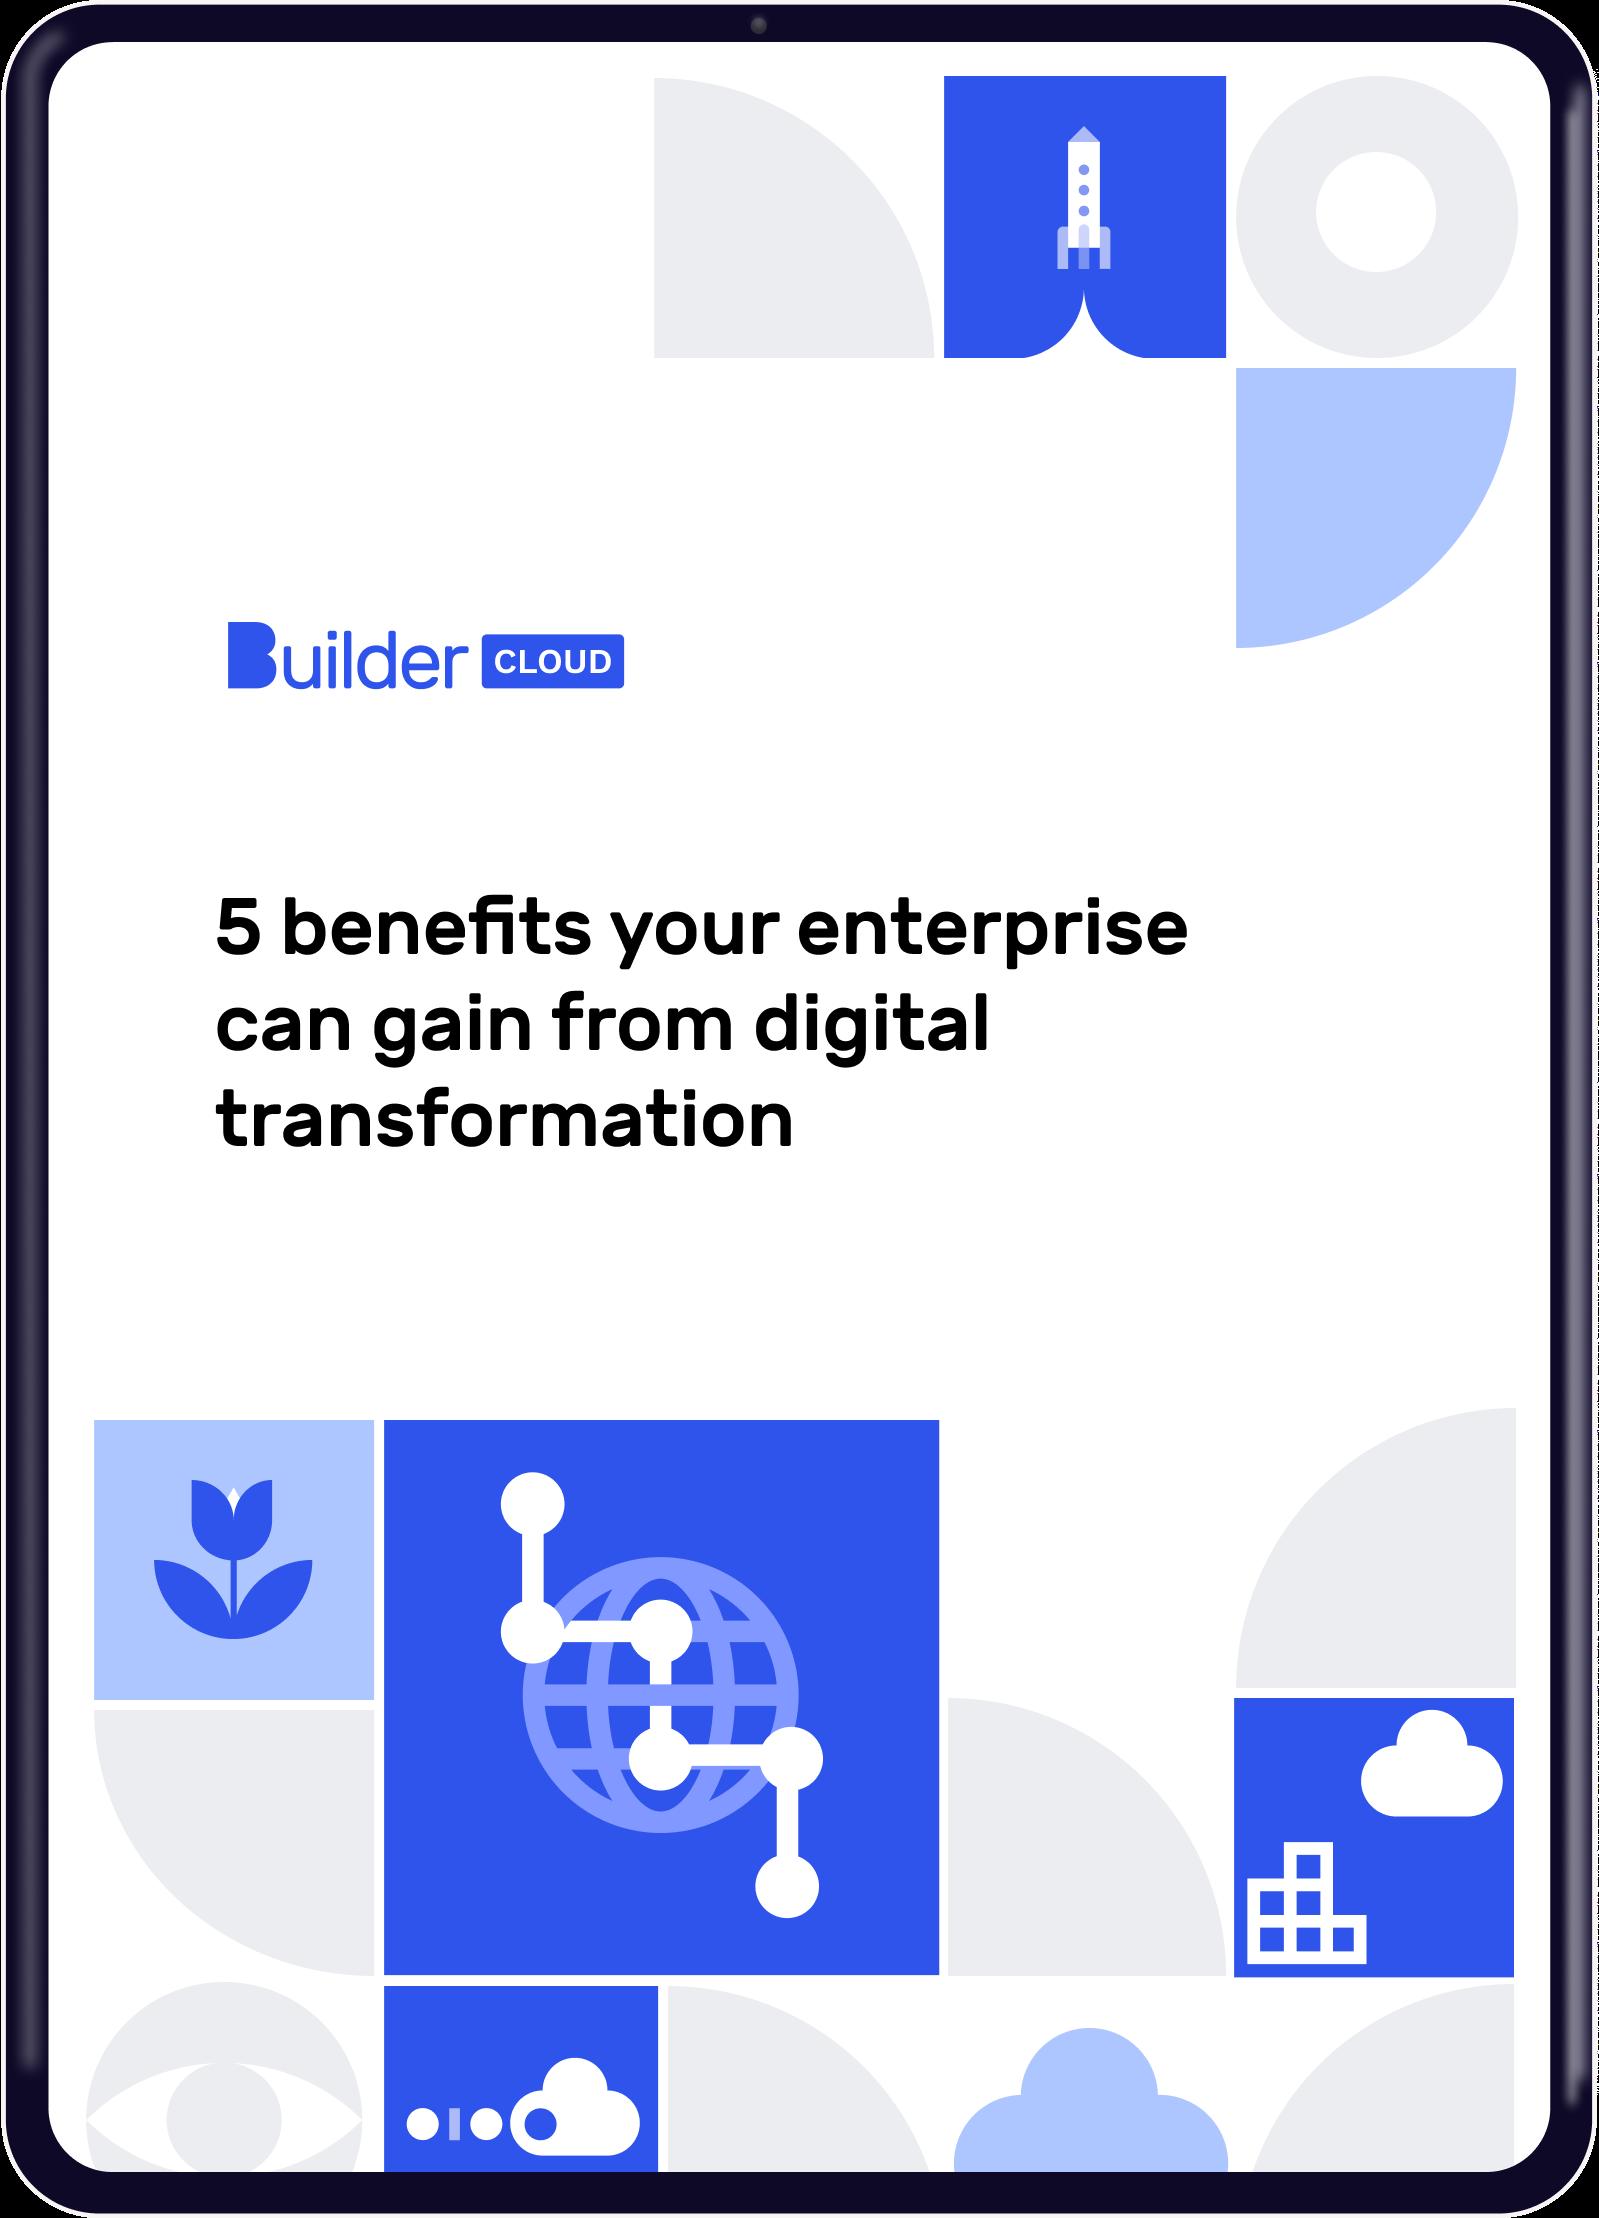 Builder Cloud e-book on digital transformation